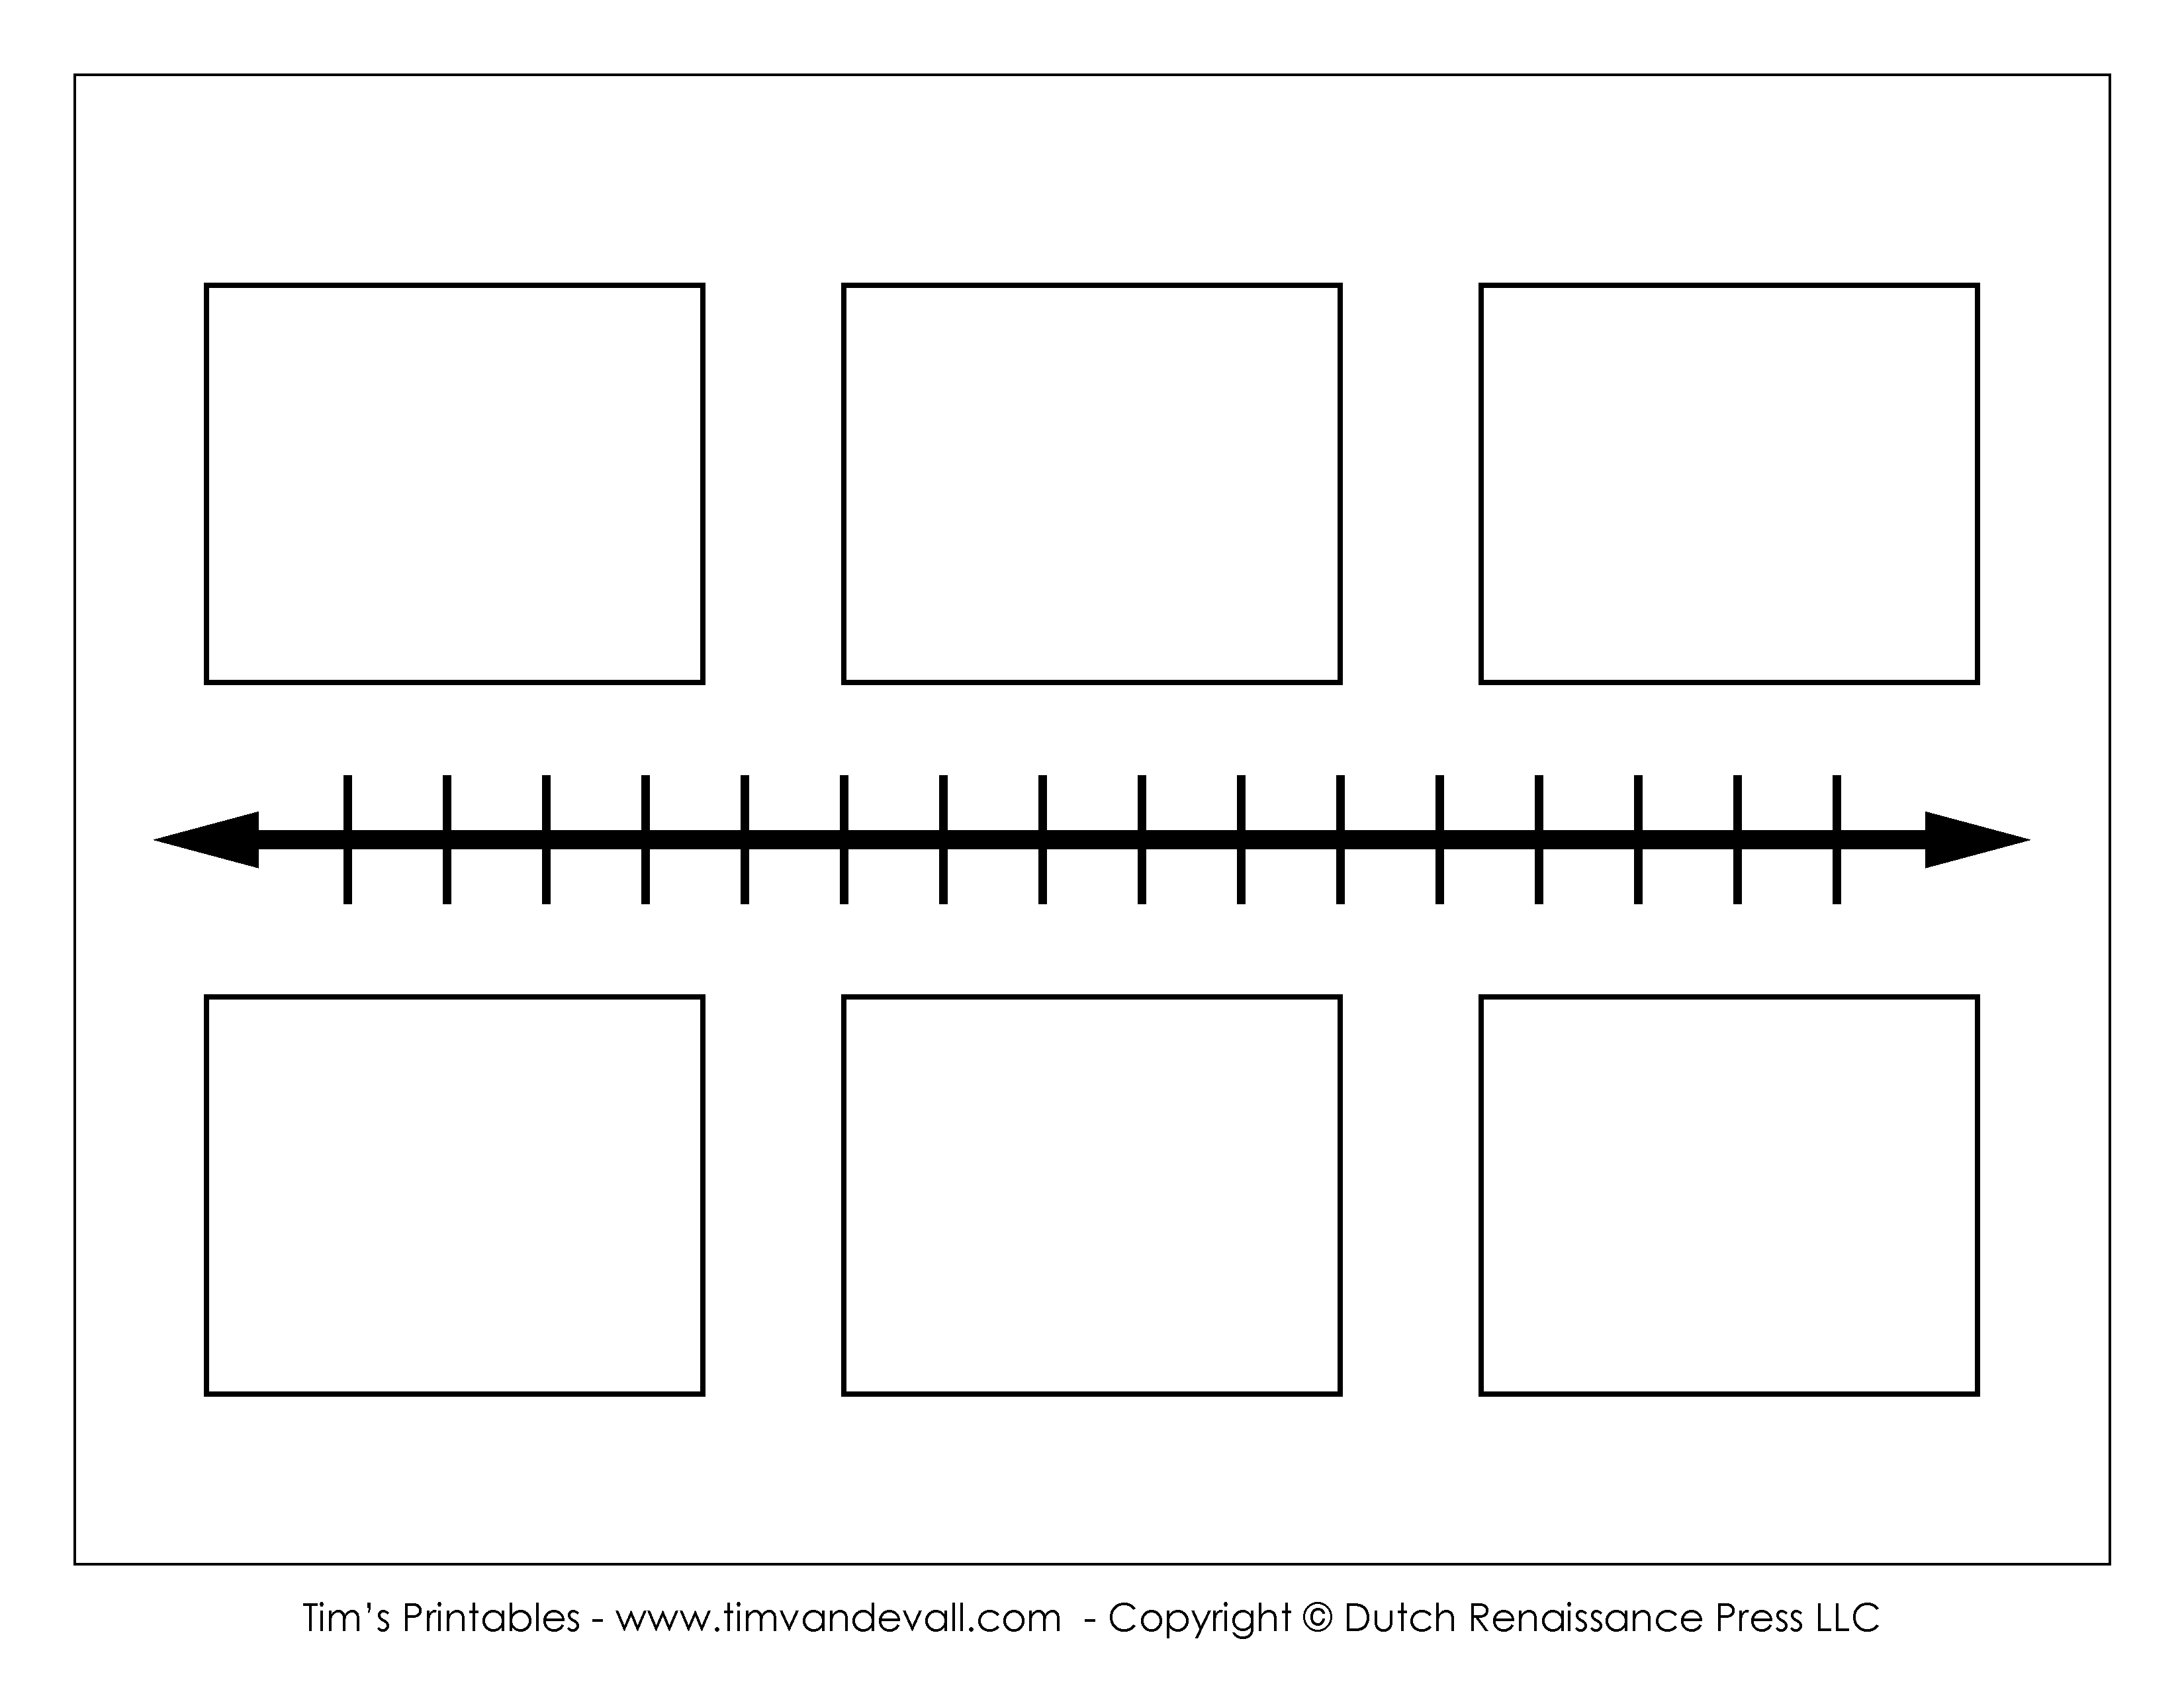 Printable Timeline Templates - Kaza.psstech.co - Free Blank Timeline Template Printable